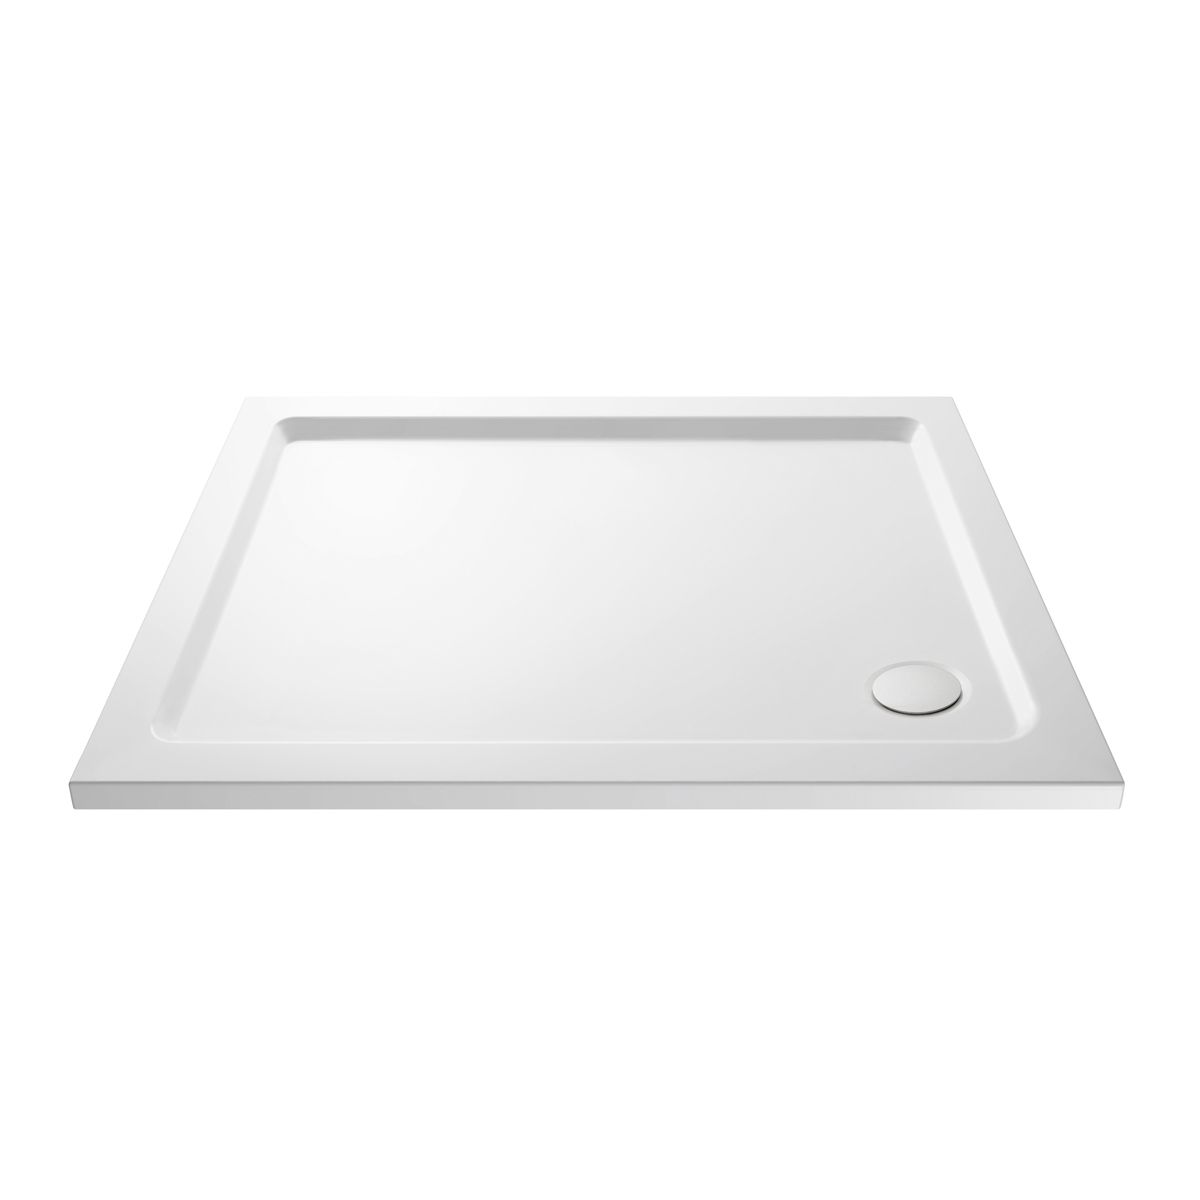 Cassellie Rectangular Shower Tray 1200 x 760mm